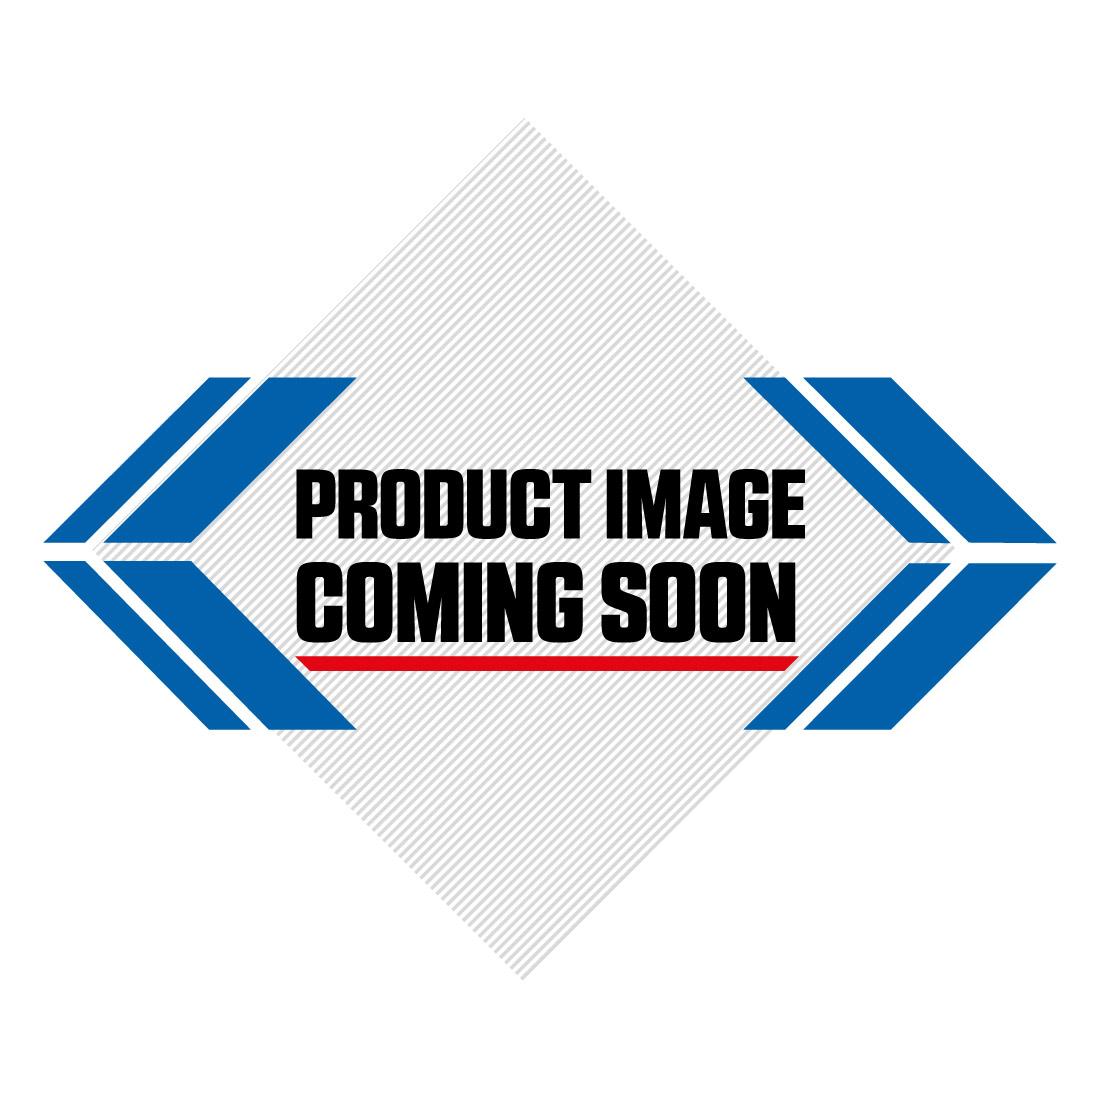 UFO KTM Plastic Kit SX 125 150 250 SXF 250 350 450 (16-18) OEM 16 Image-5